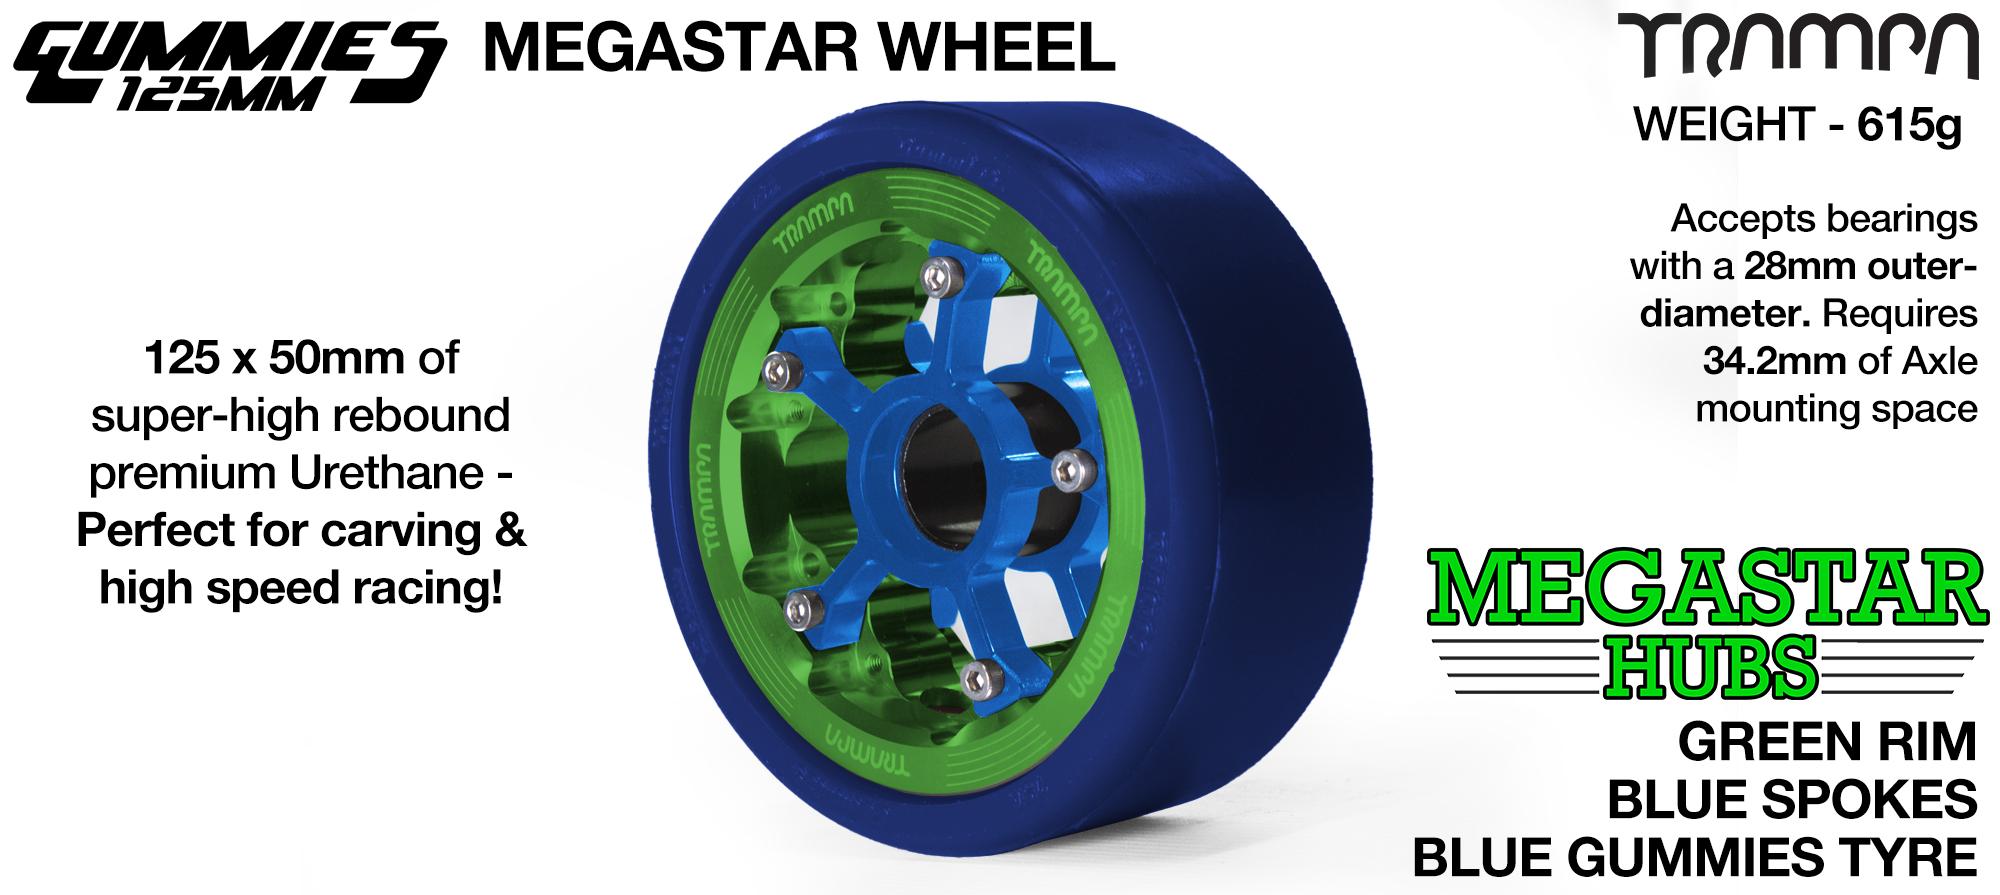 Matt BLACK MEGASTAR Rim with BLACK Spokes with BLACK Gummies - The Ulrimate Longboard Wheel